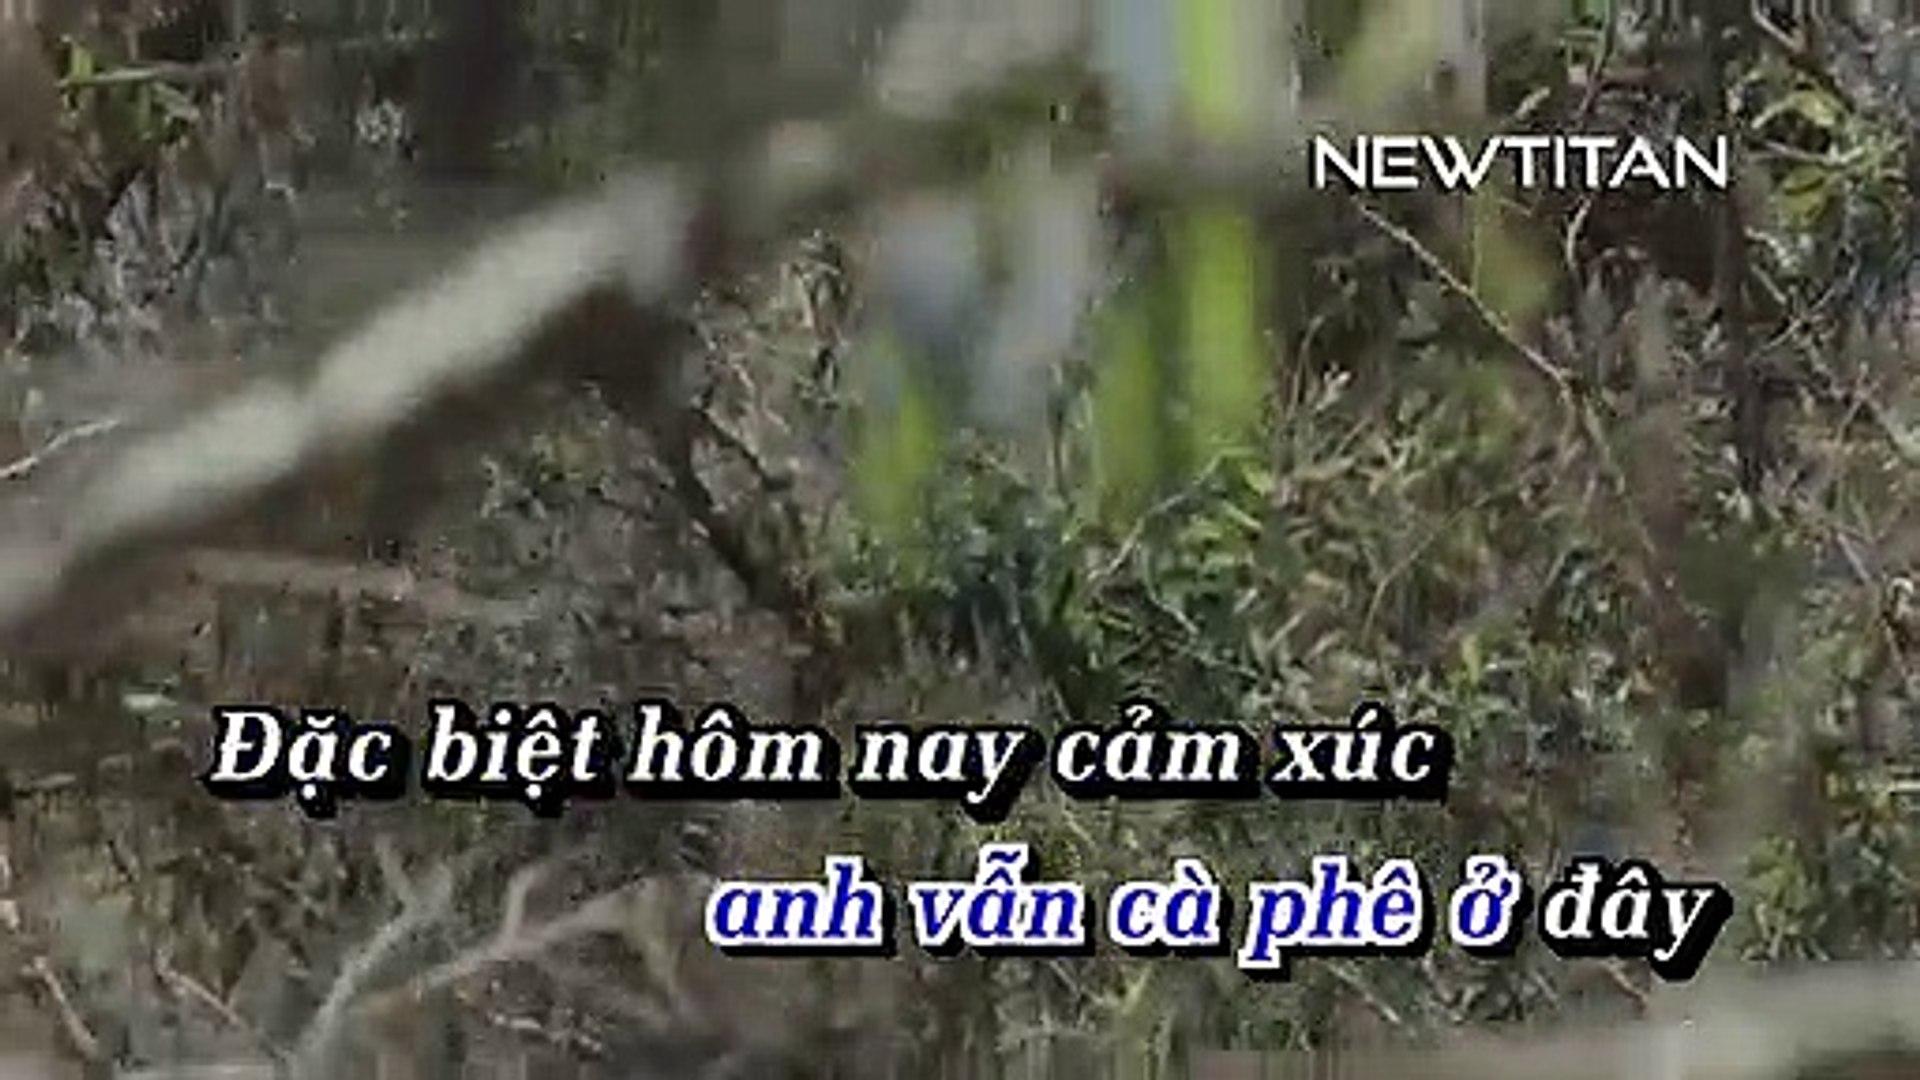 [Karaoke] Mò Kim Đáy Bể - Vương Anh Tú [Beat]